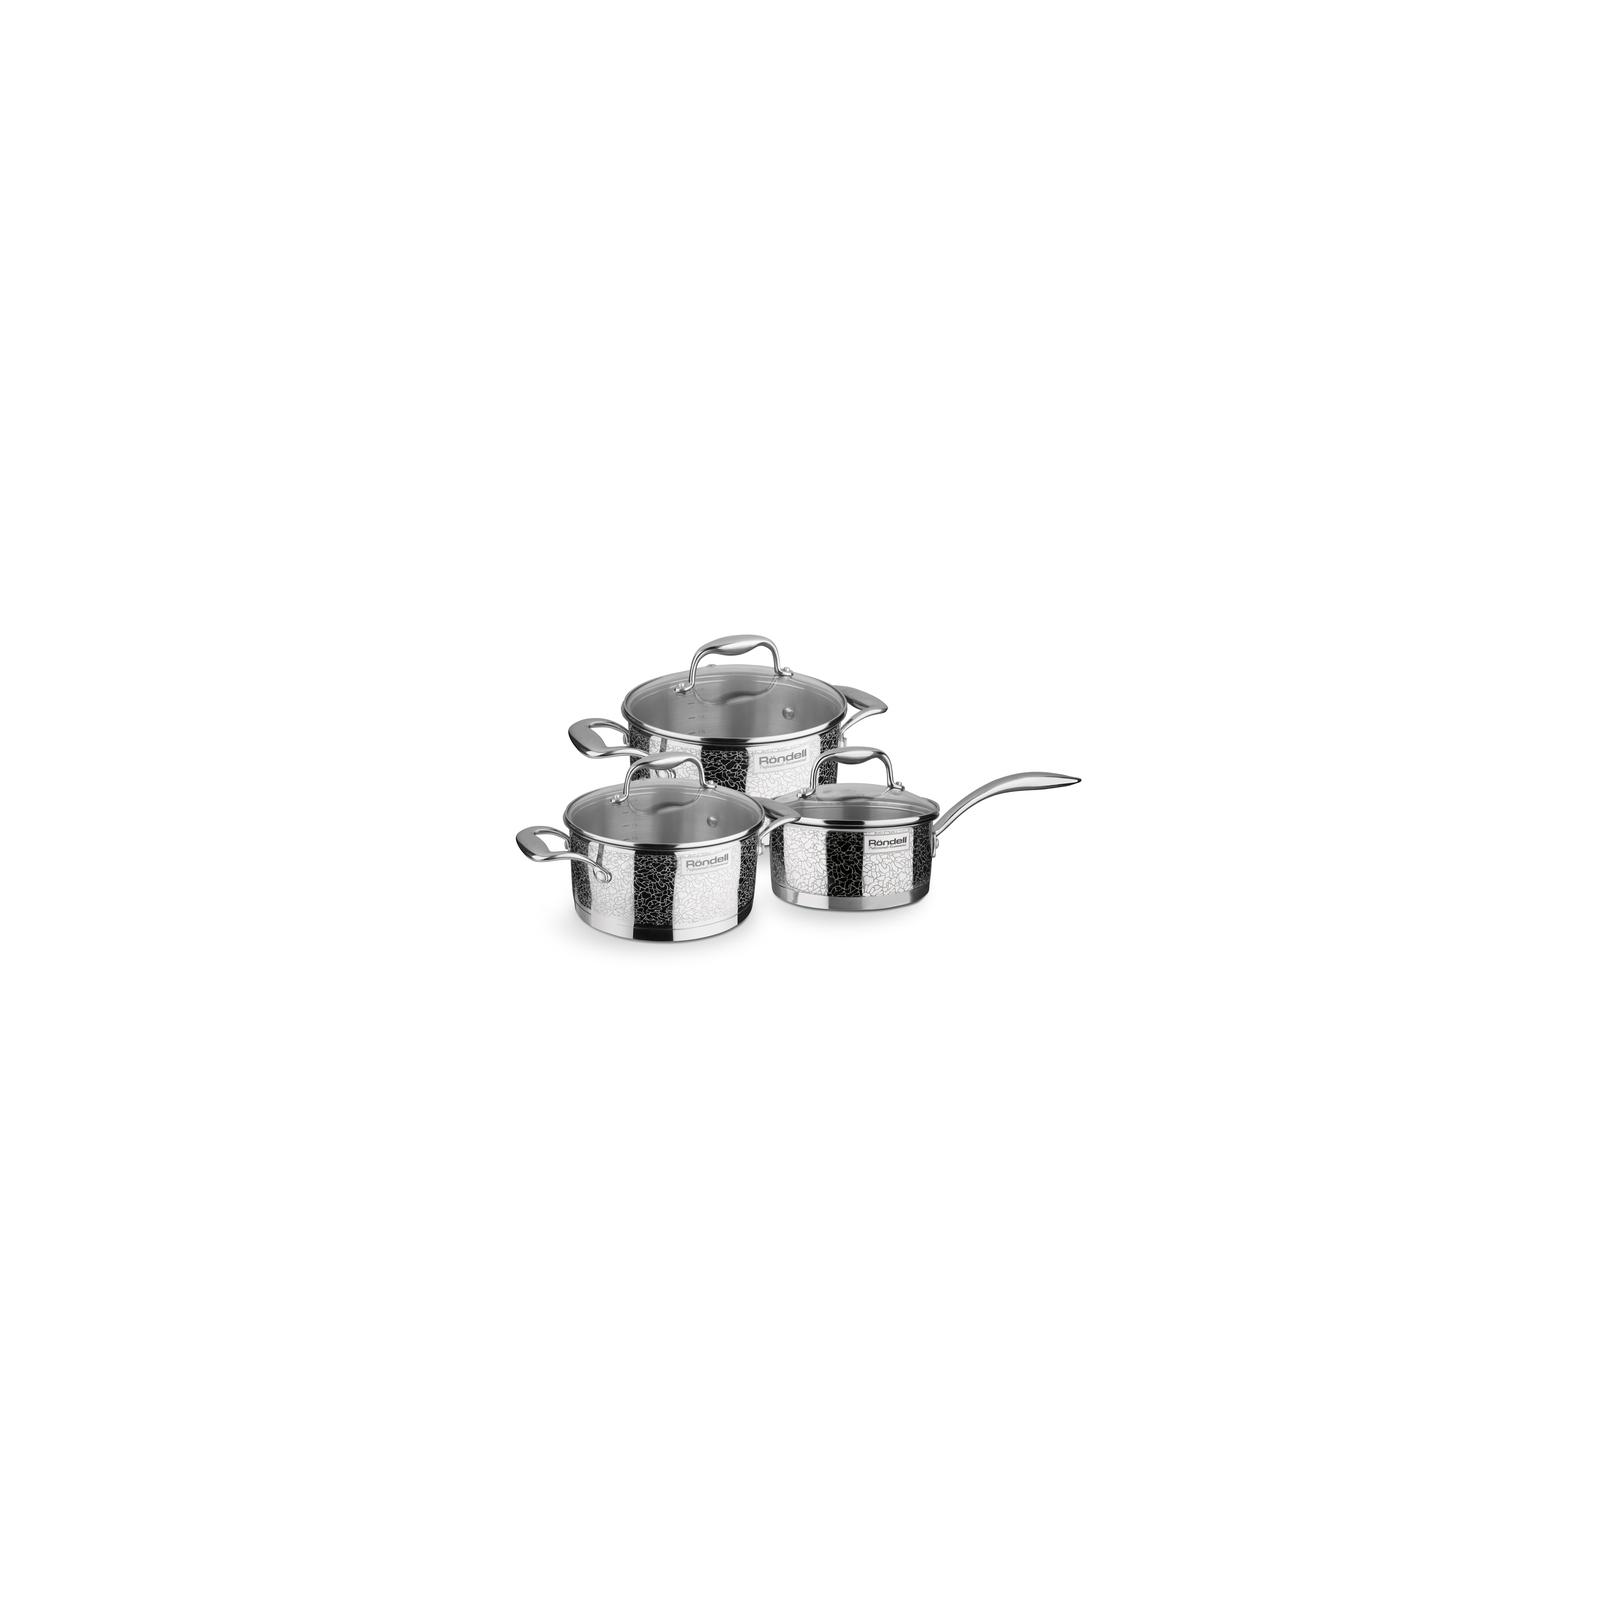 Набор посуды Rondell Vintage 6 предметов (RDS-379)